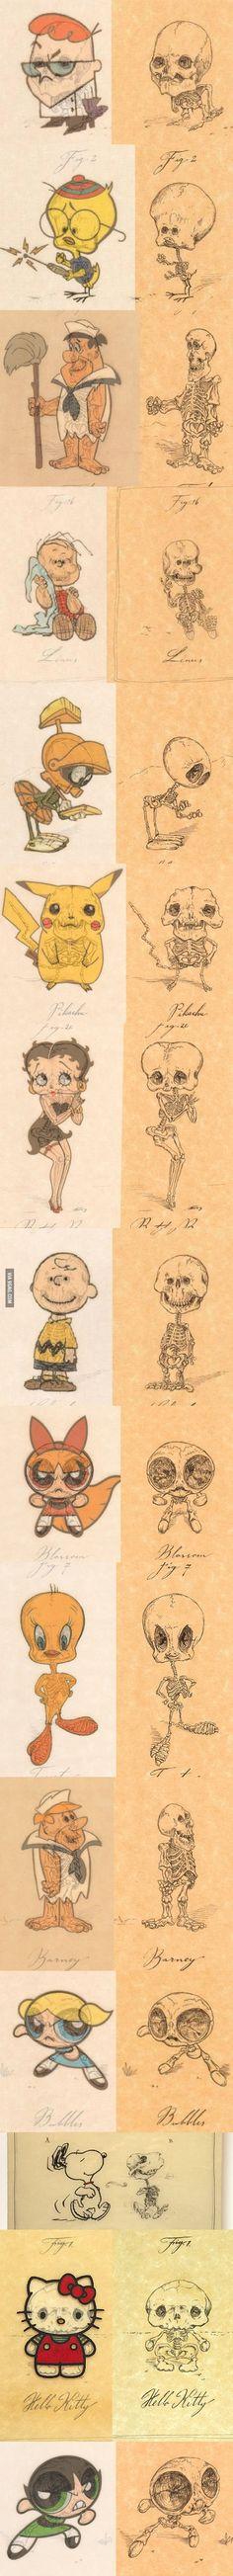 Anatomy of Cartoon Characters - by Michael Paulus